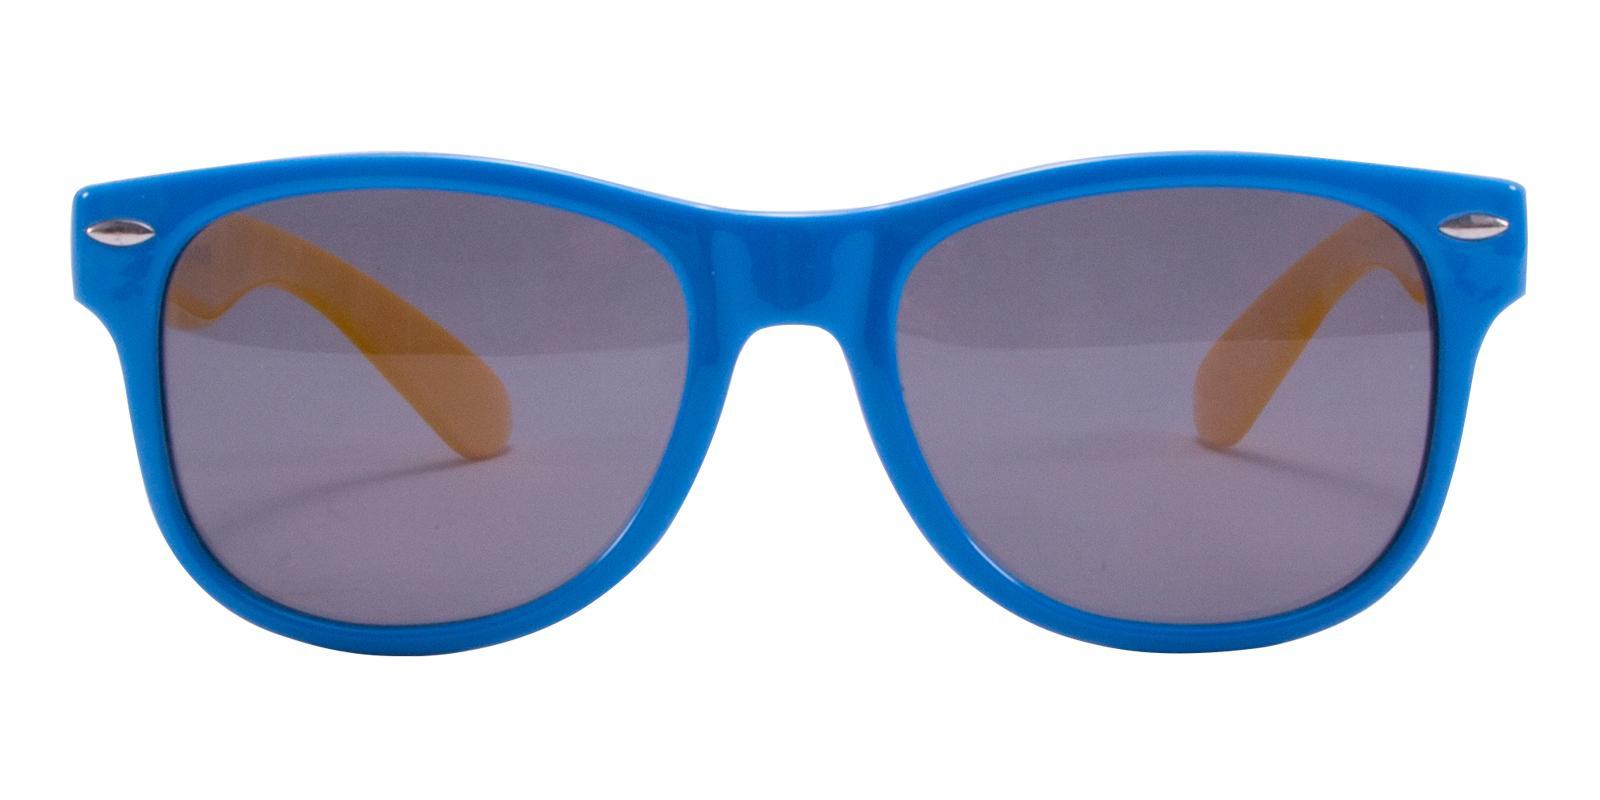 Obsid Blue TR Sunglasses , UniversalBridgeFit Frames from ABBE Glasses